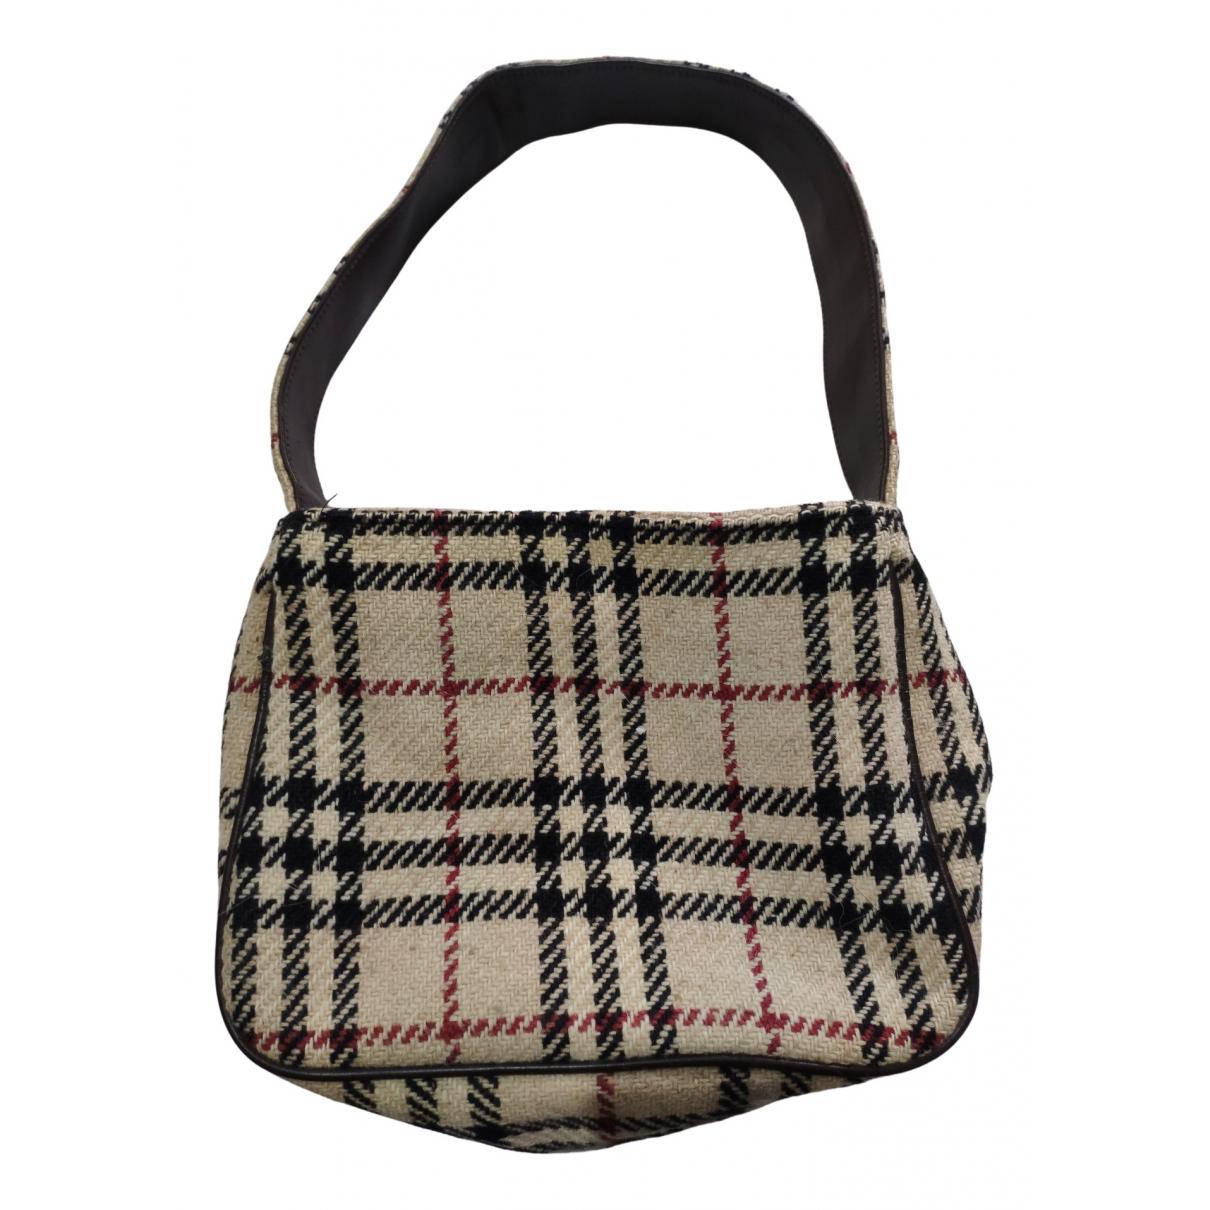 Burberry \N Handtasche in  Kamel Wolle